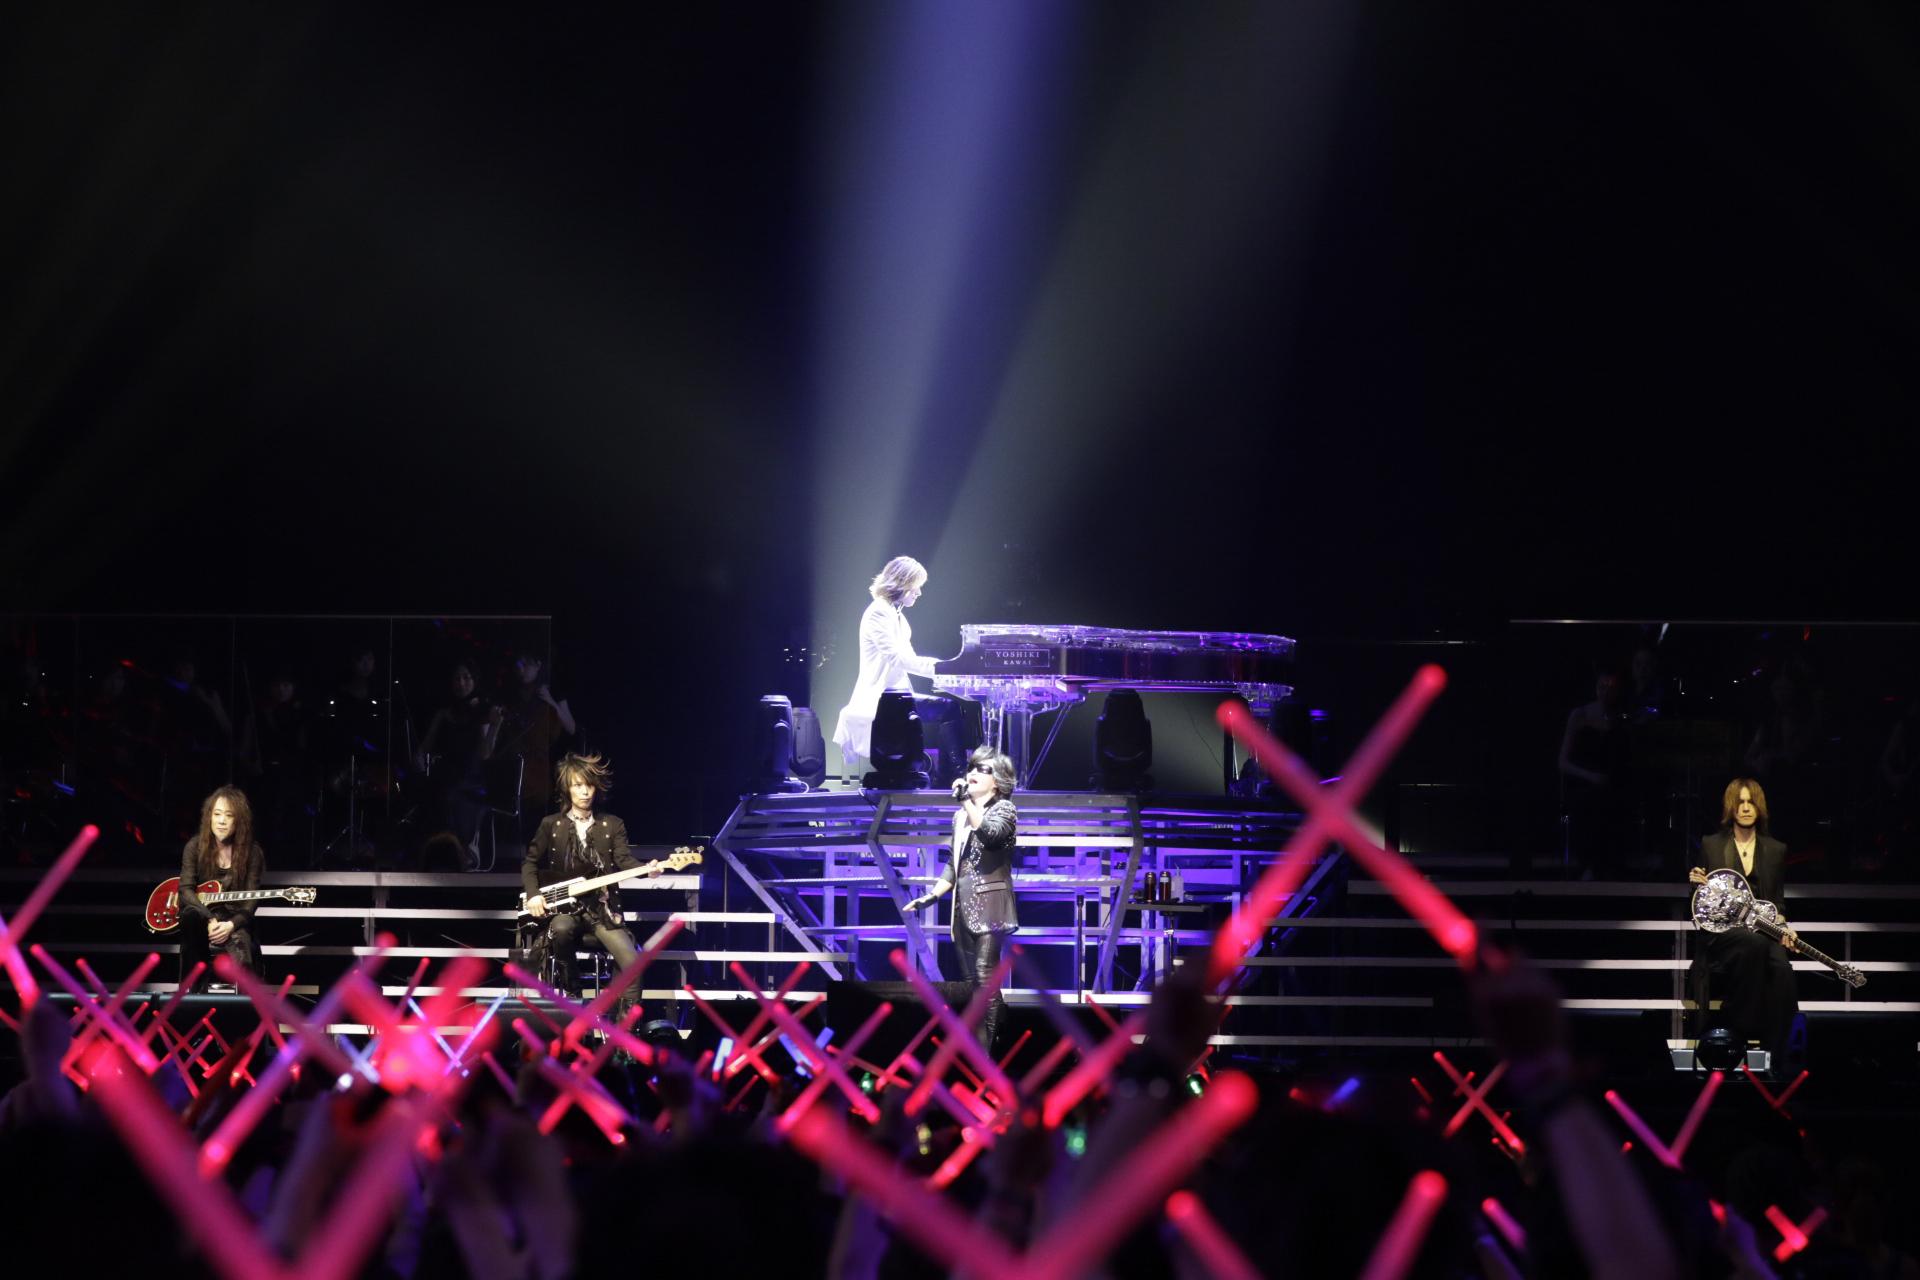 JRock247-X-Japan-Yokohama-Arena-2017-0717-5972